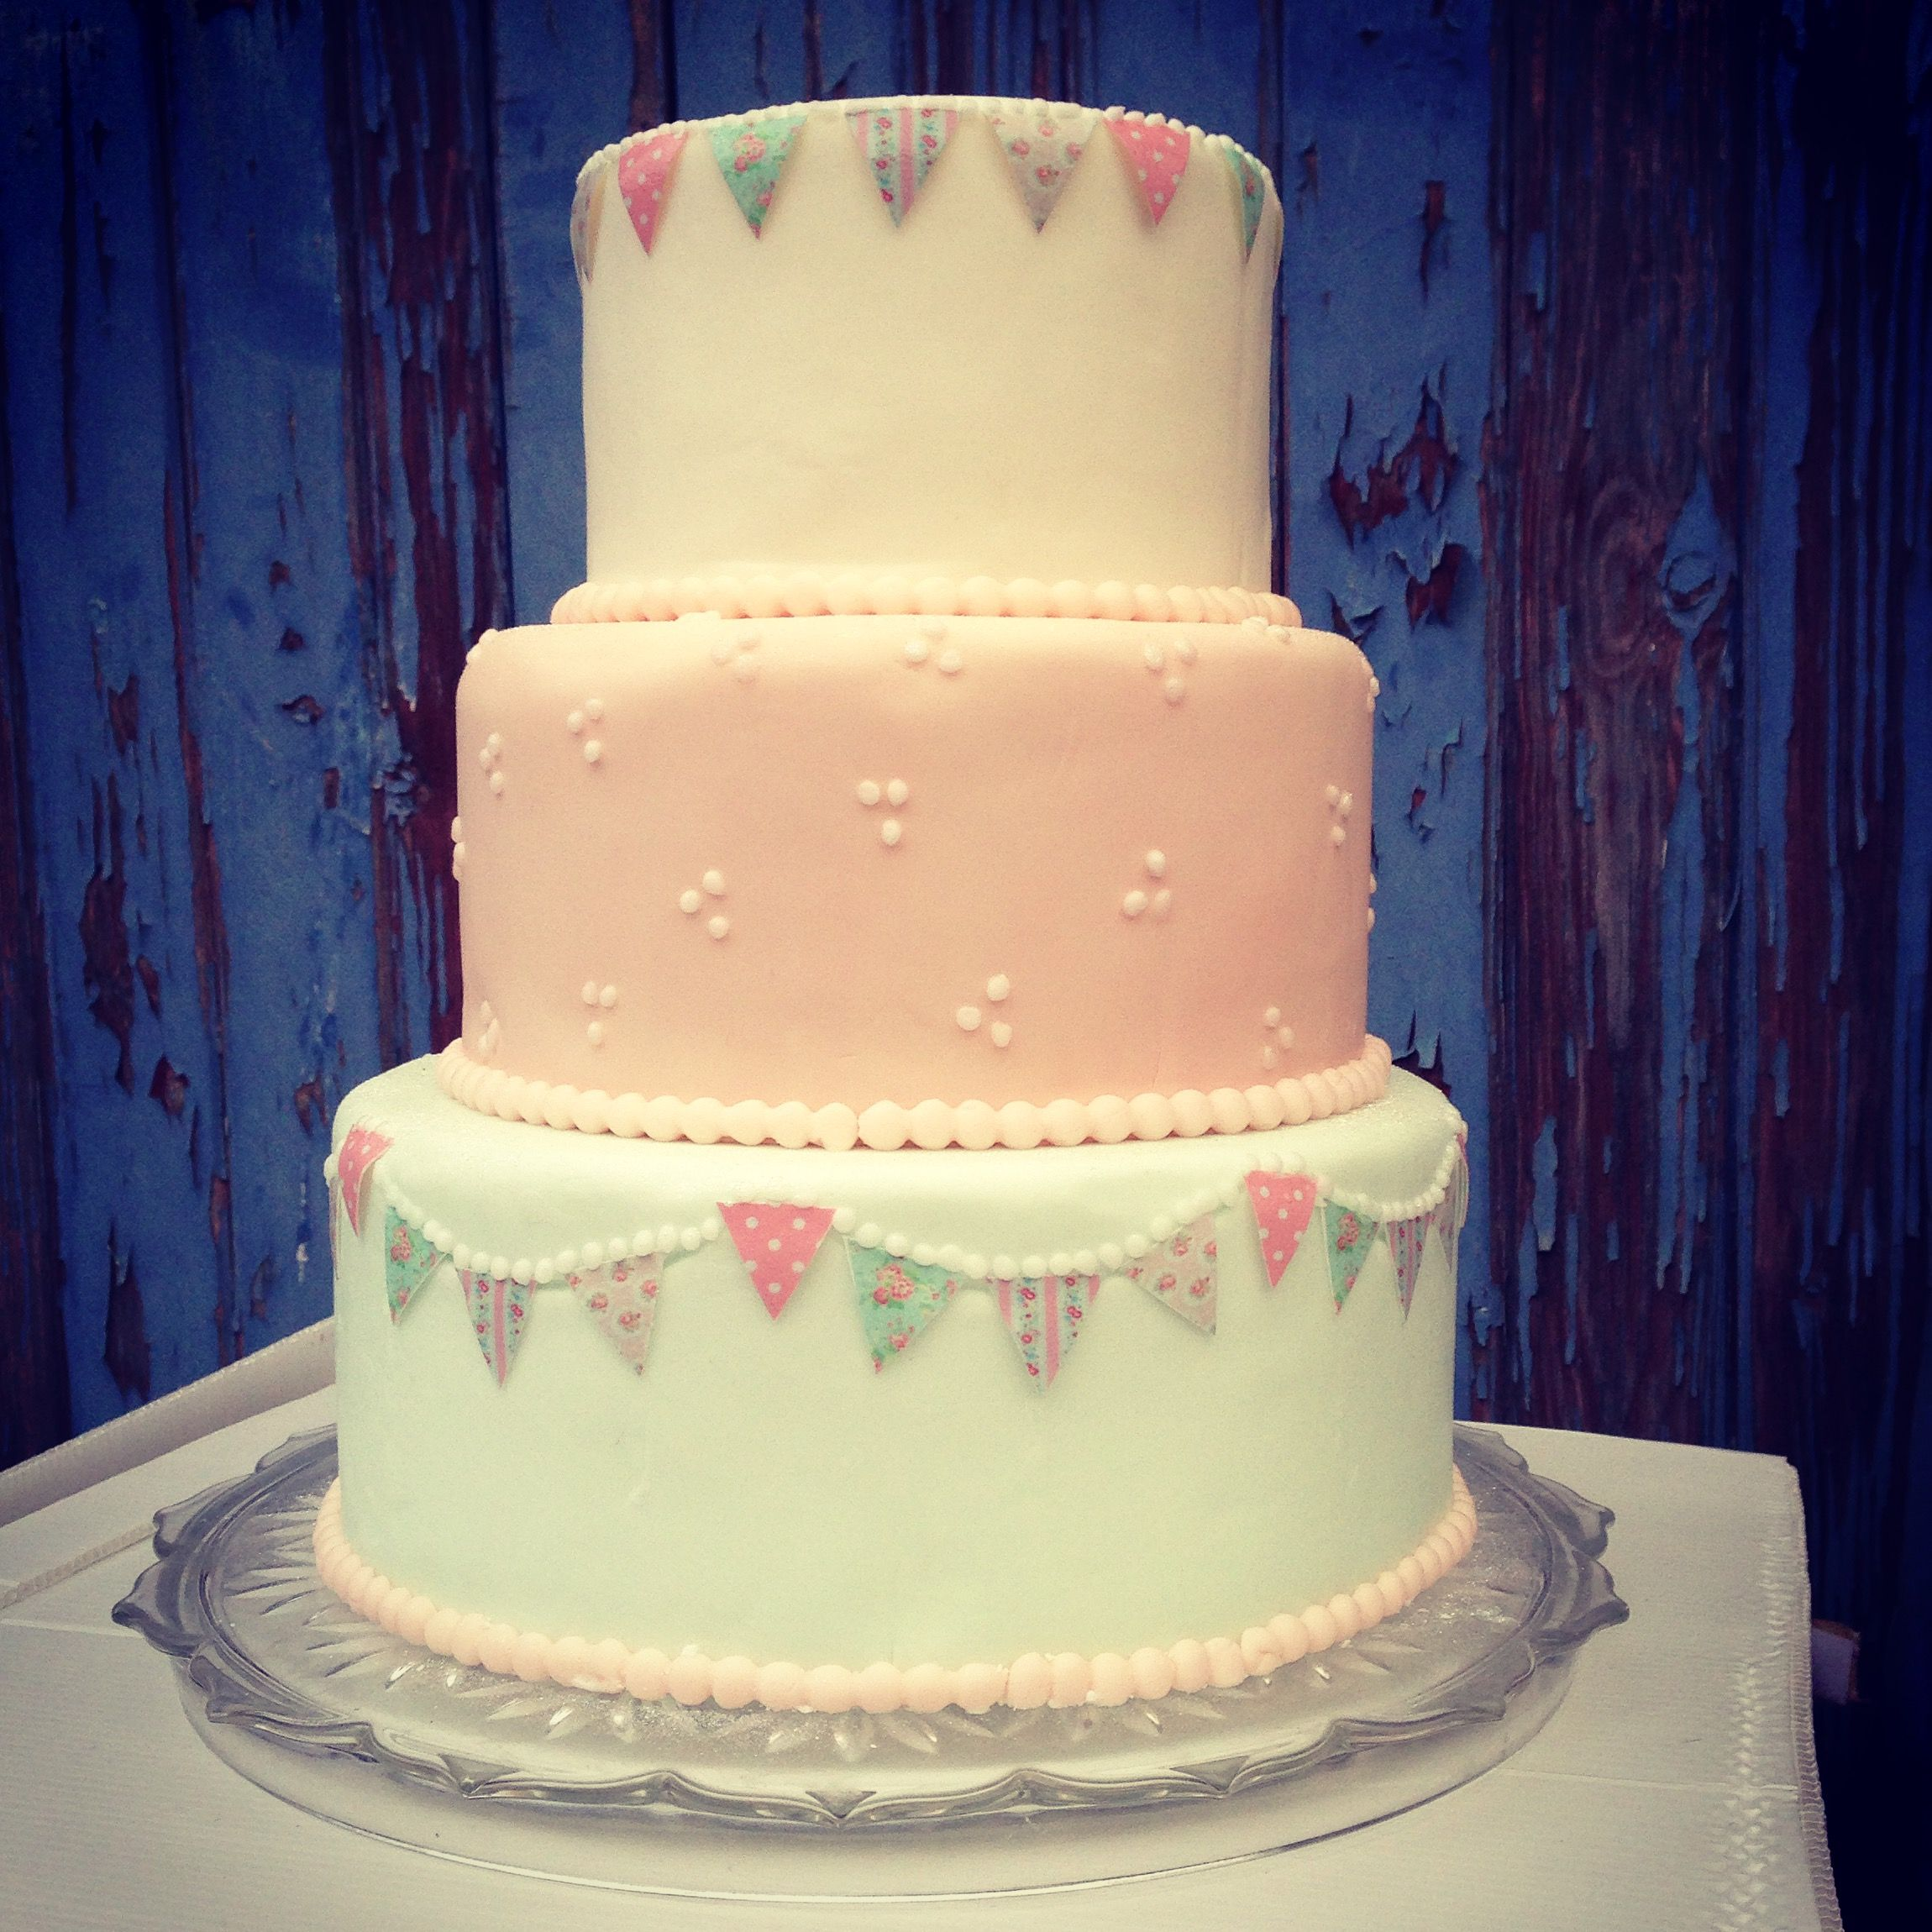 Bunting 3 tier Wedding Cake | Vanilla teas Wedding Cakes | Pinterest ...